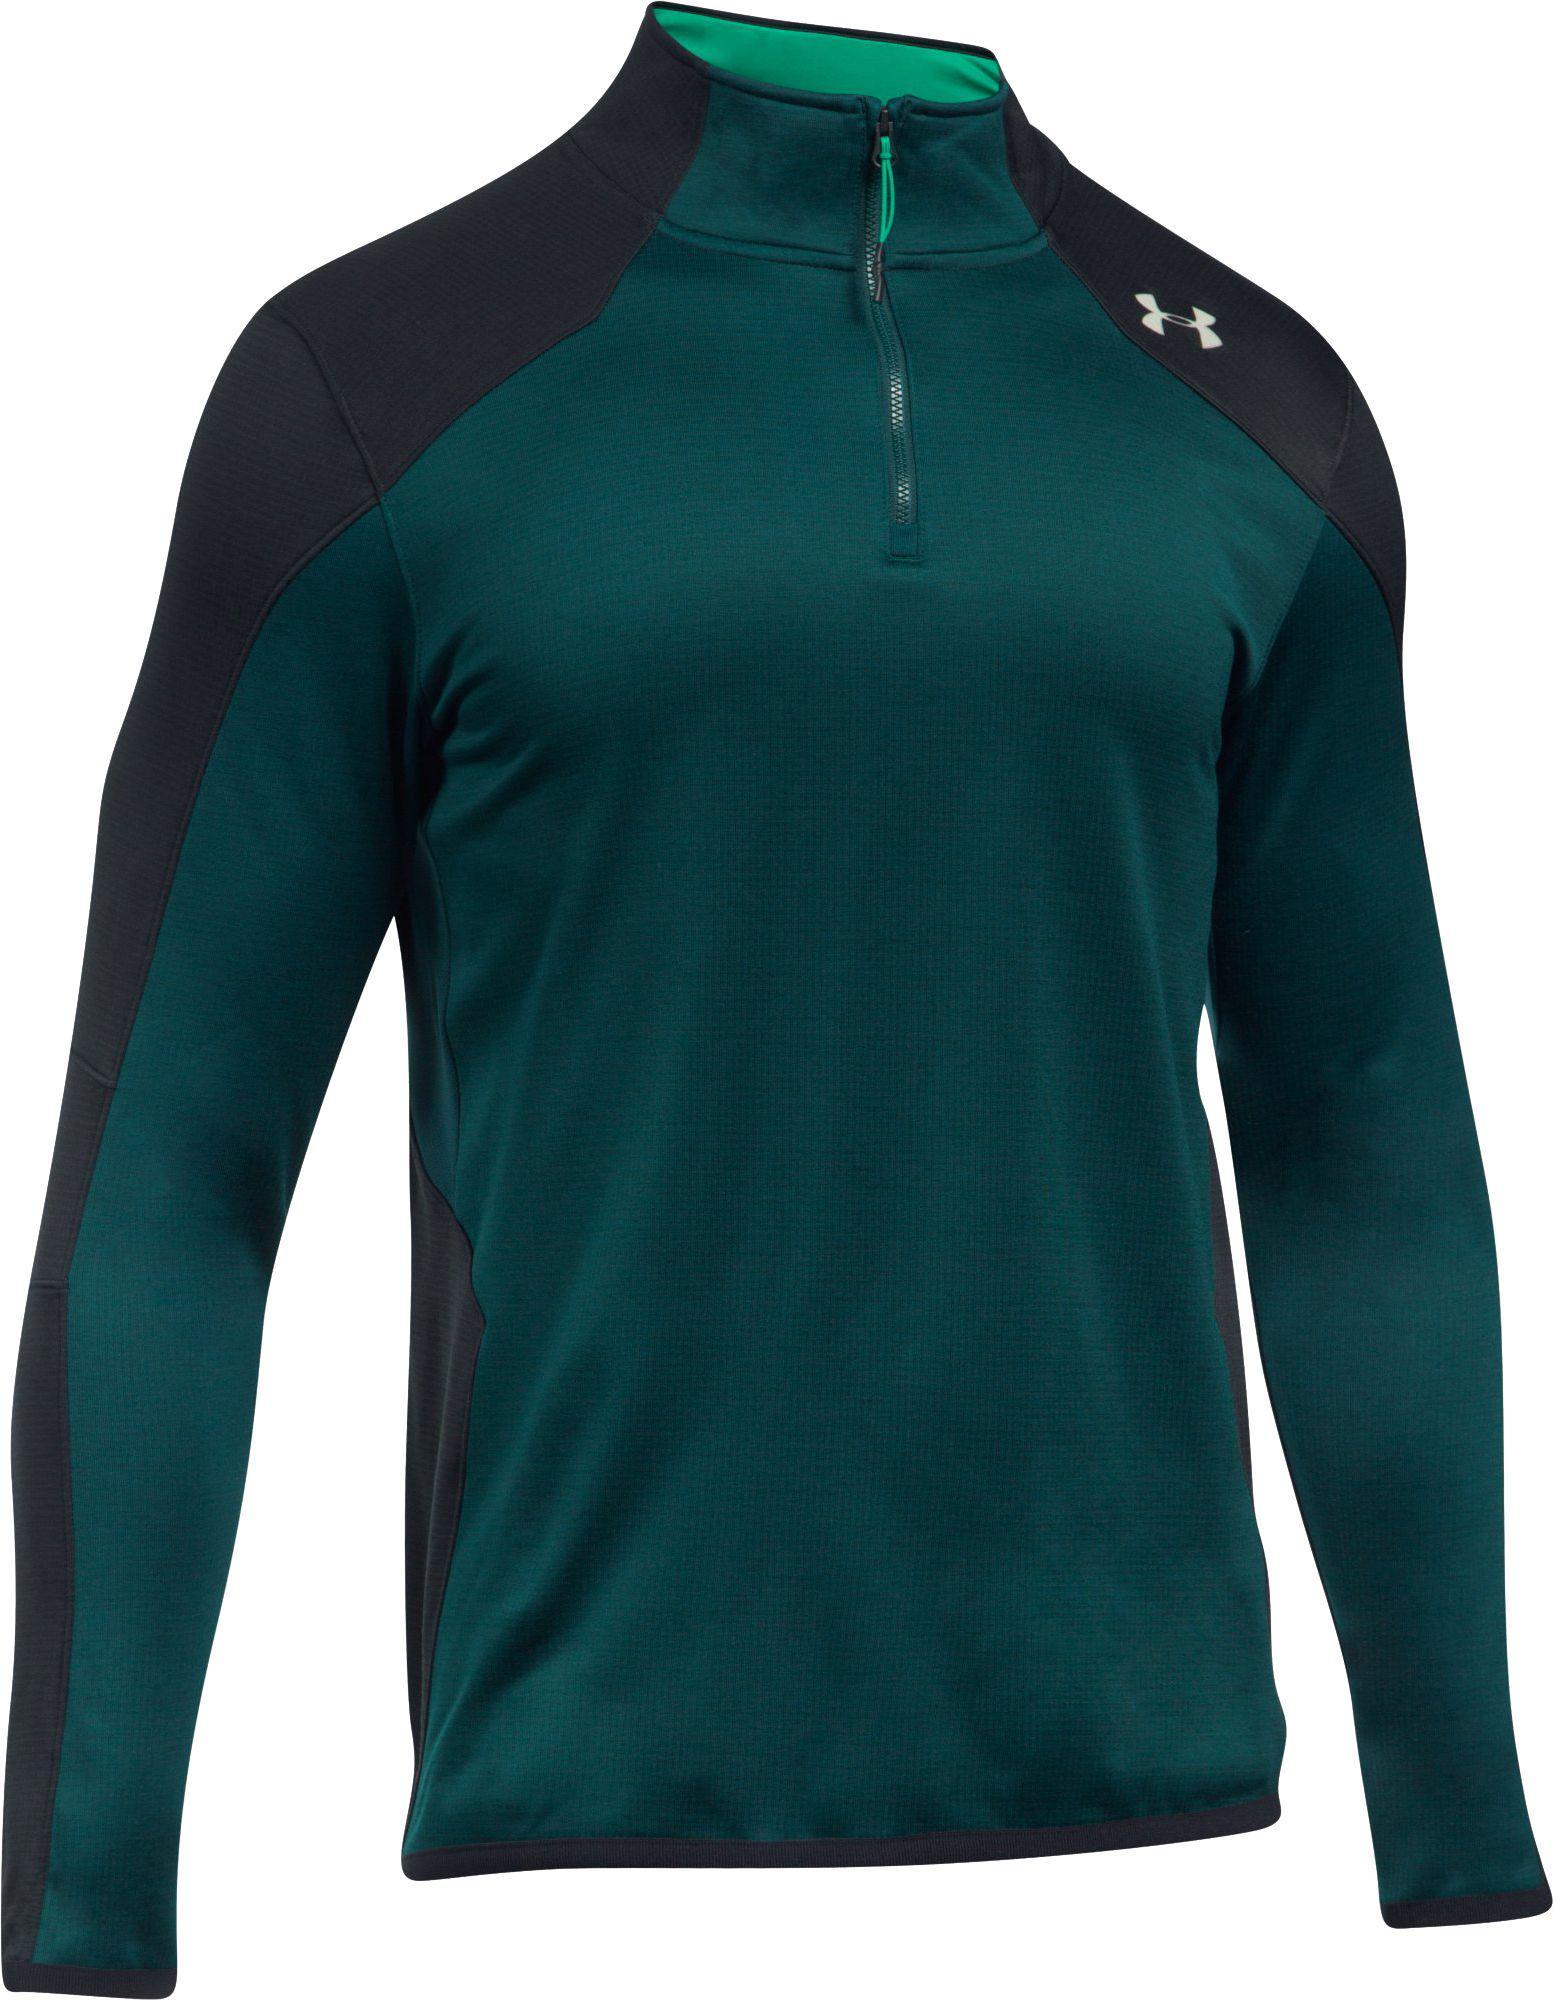 ce3942a20b3 Under Armour - Multicolor Coldgear Reactor 1 4 Zip Long Sleeve T-shirt for